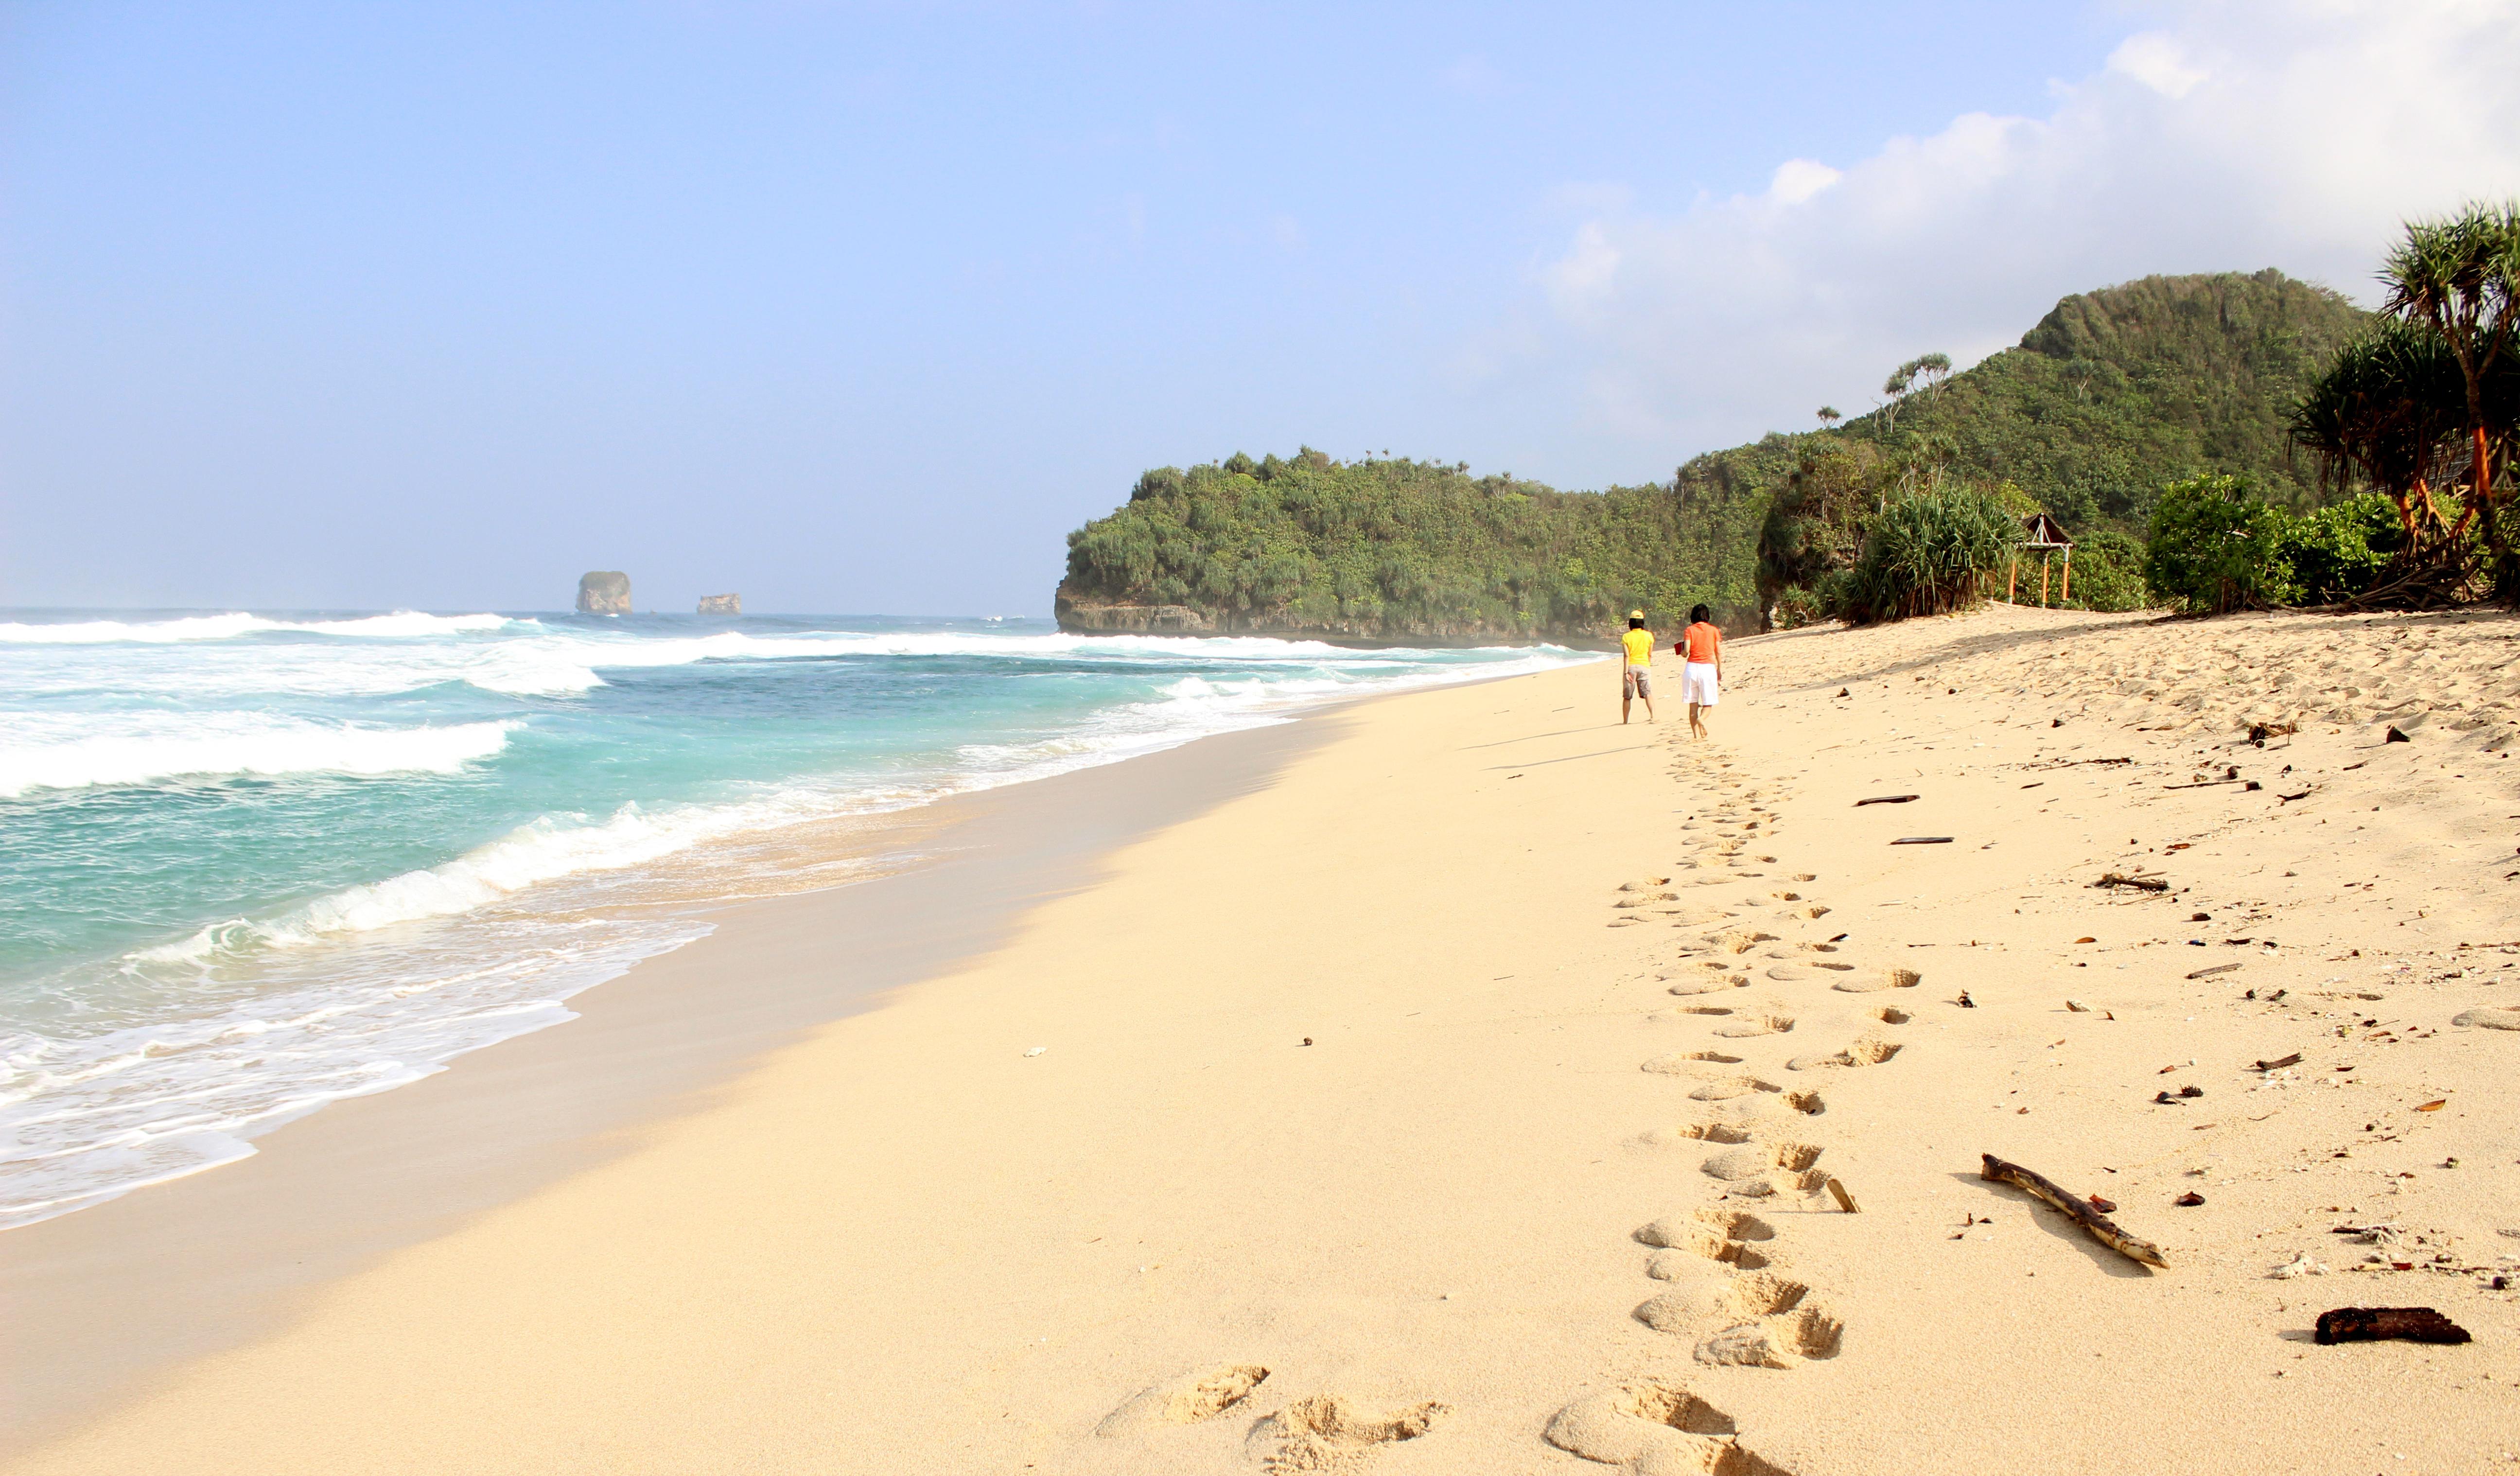 Pantai Goa Cina Wikipedia Bahasa Indonesia Ensiklopedia Bebas